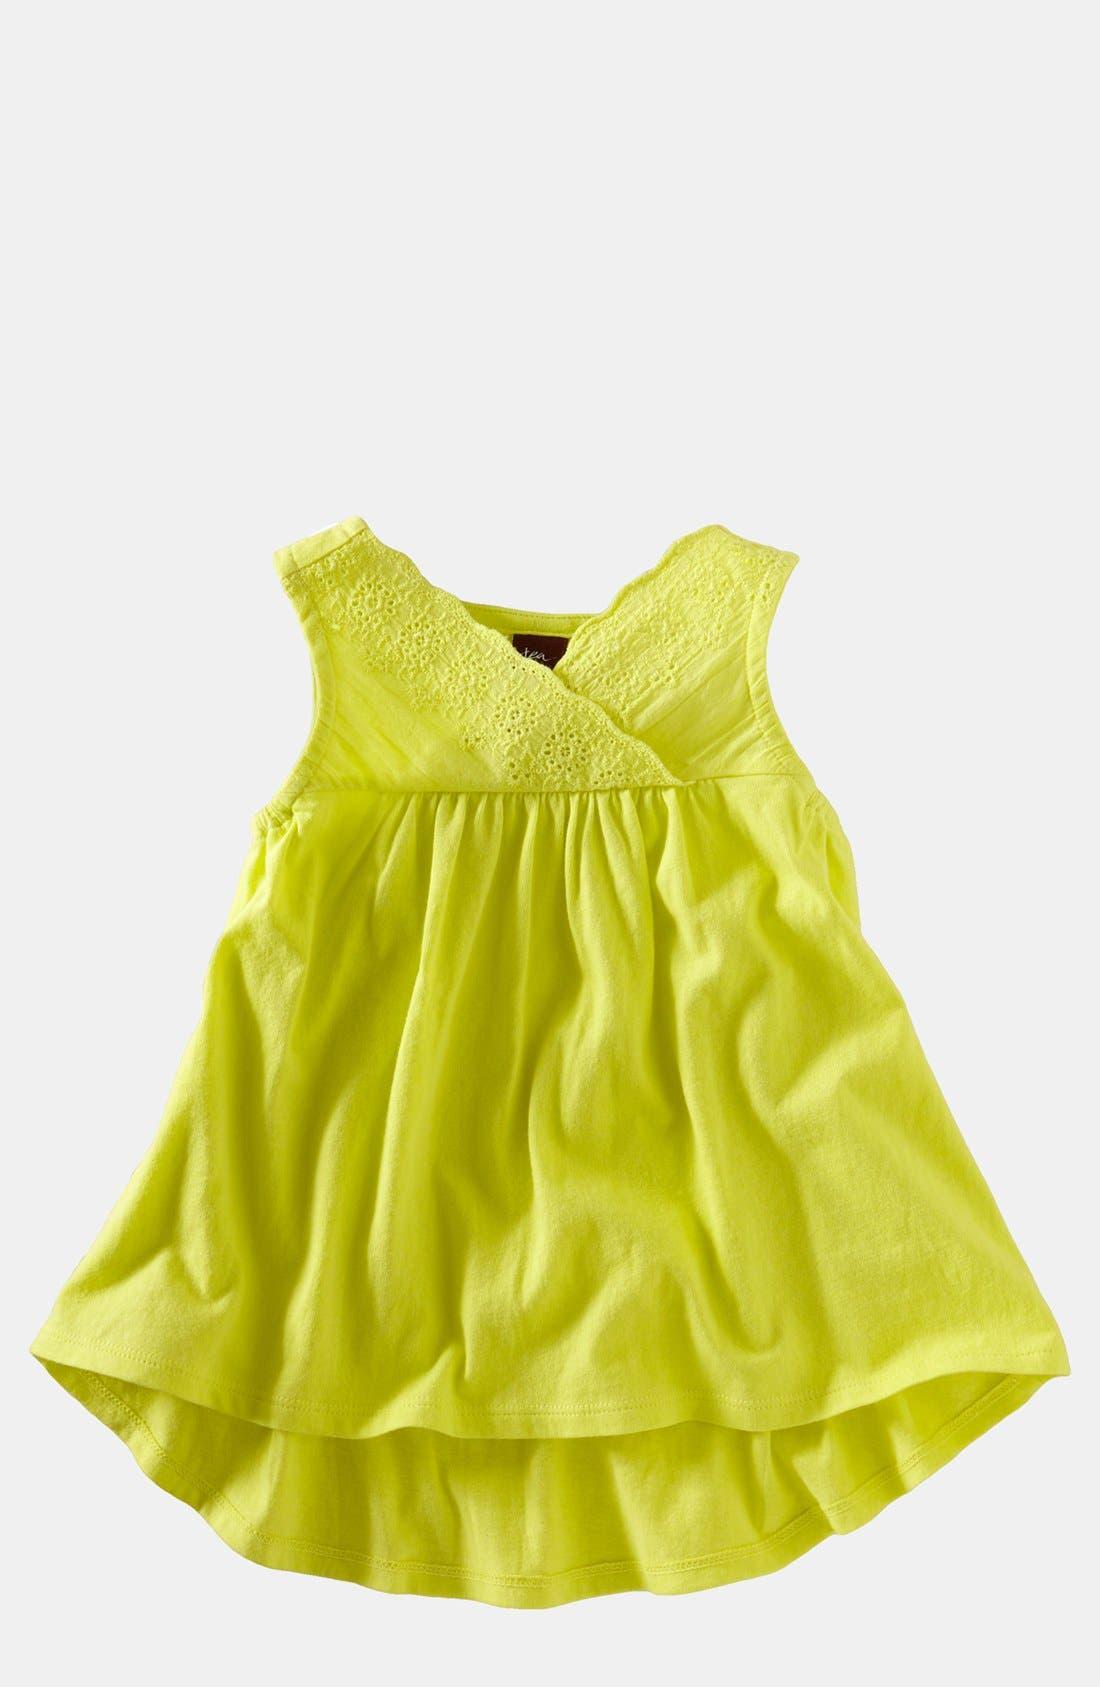 Main Image - Tea Collection Sleeveless Top (Little Girls & Big Girls)